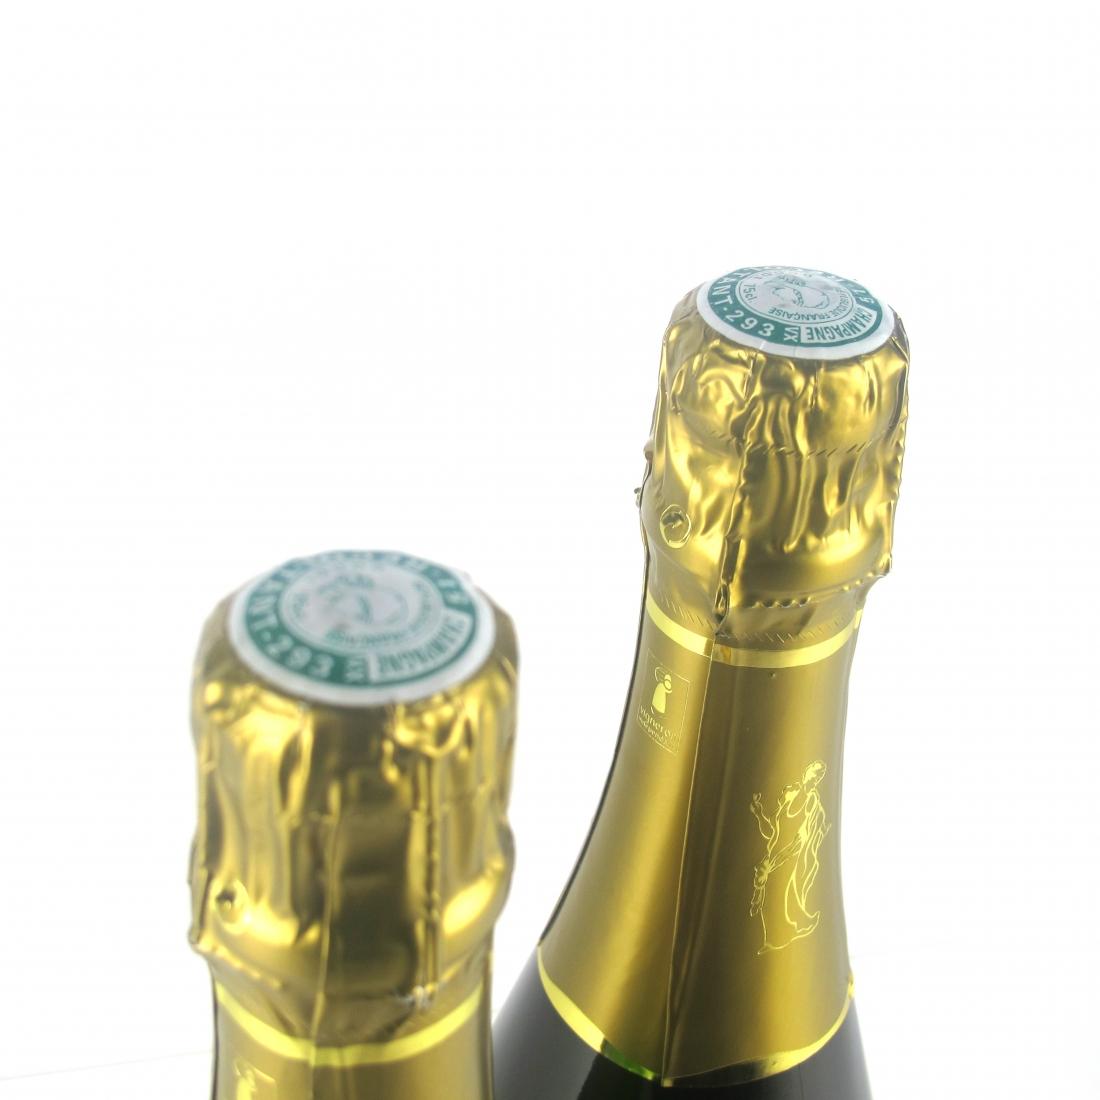 Gonet Sulcova Extra-Brut NV Champagne 2x75cl